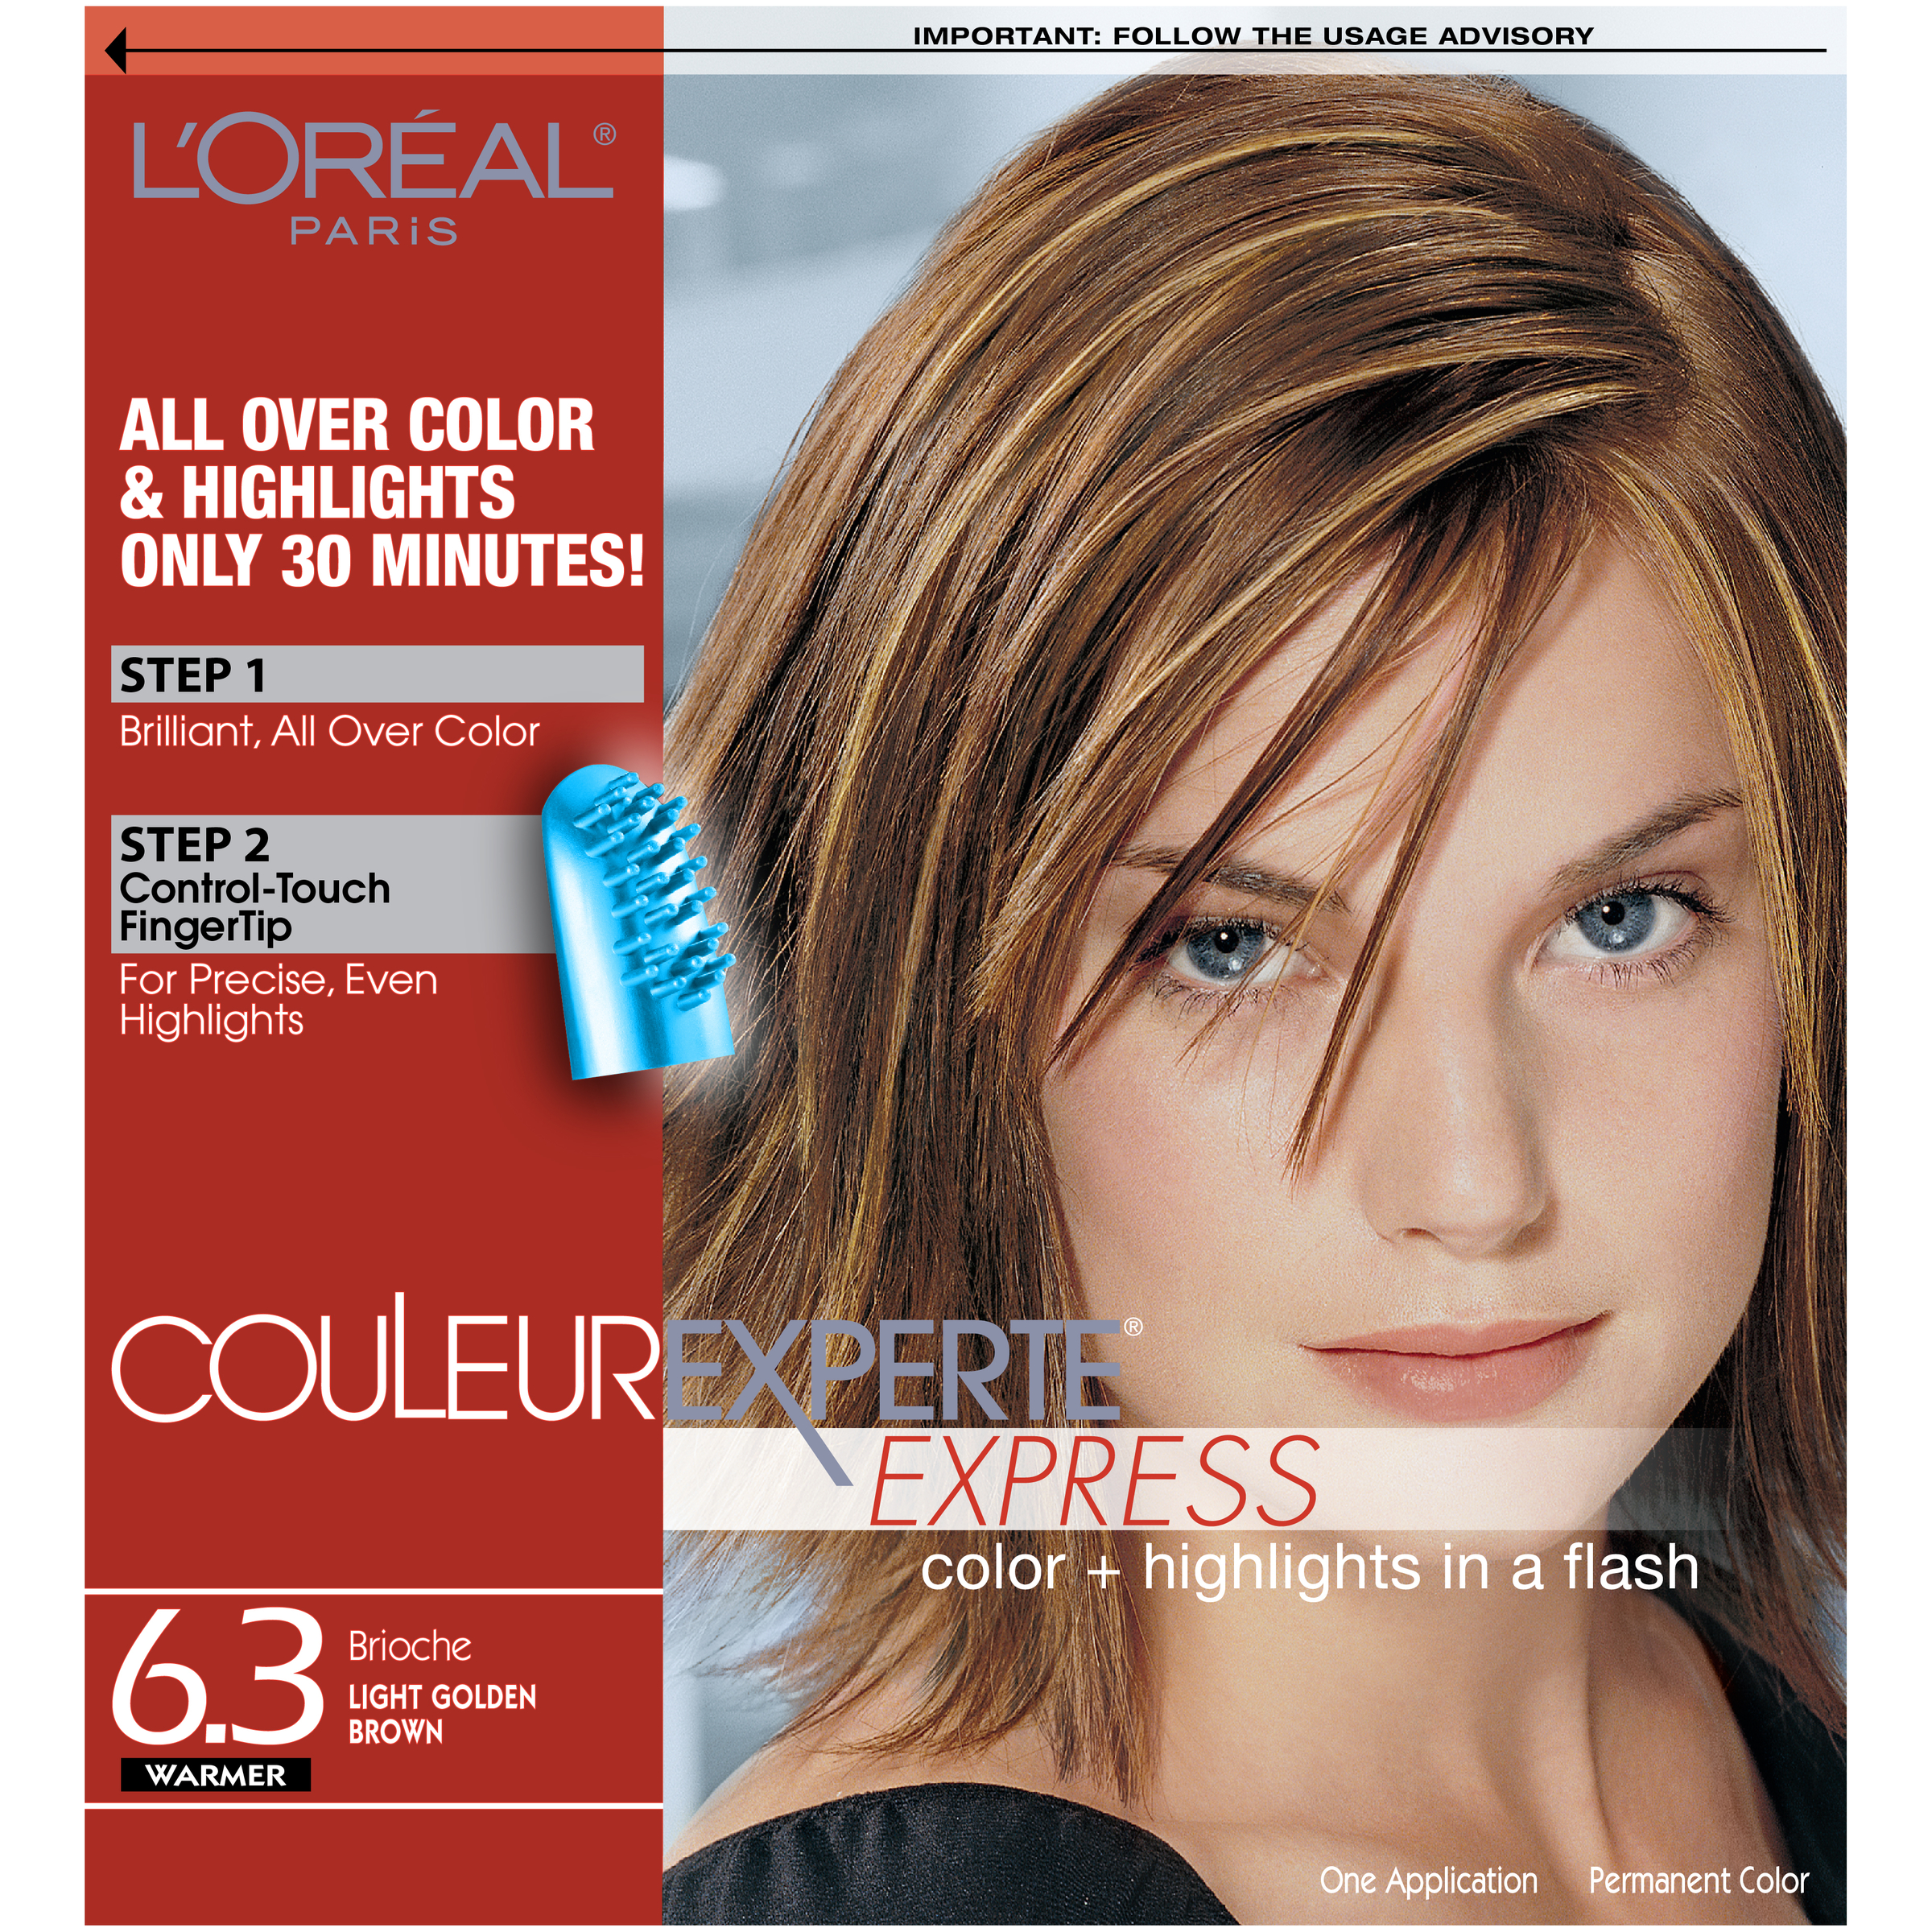 Loral Paris Couleur Experte Hair Color Hair Highlights Ebay